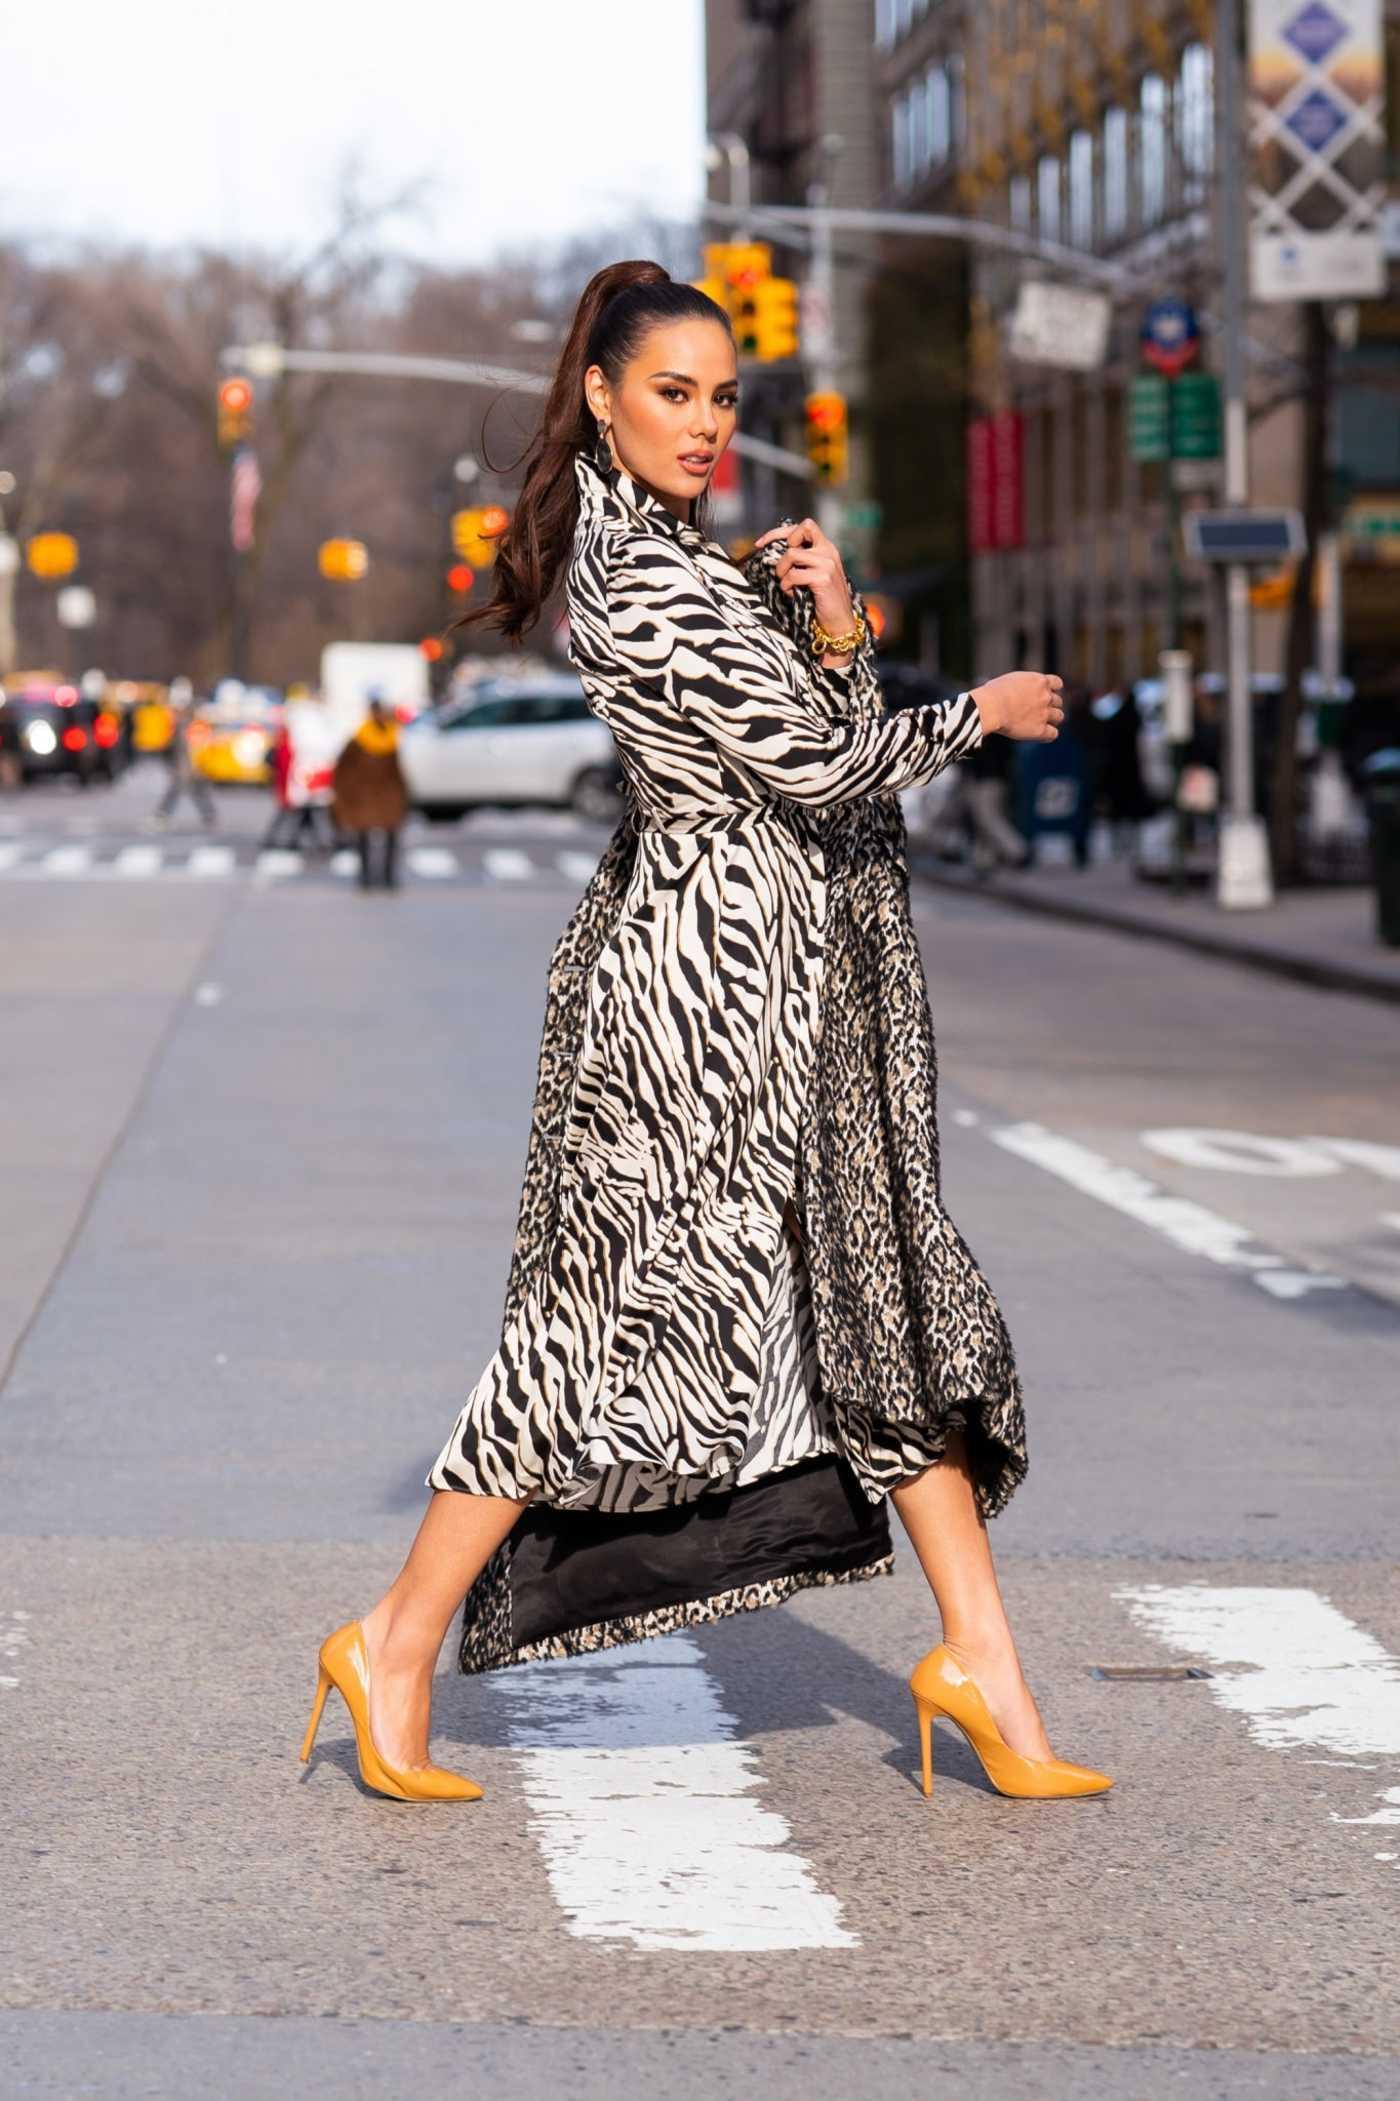 Catriona Gray in a Leopard Print Fur Coat Was Seen in Midtown in New York City 01/07/2019